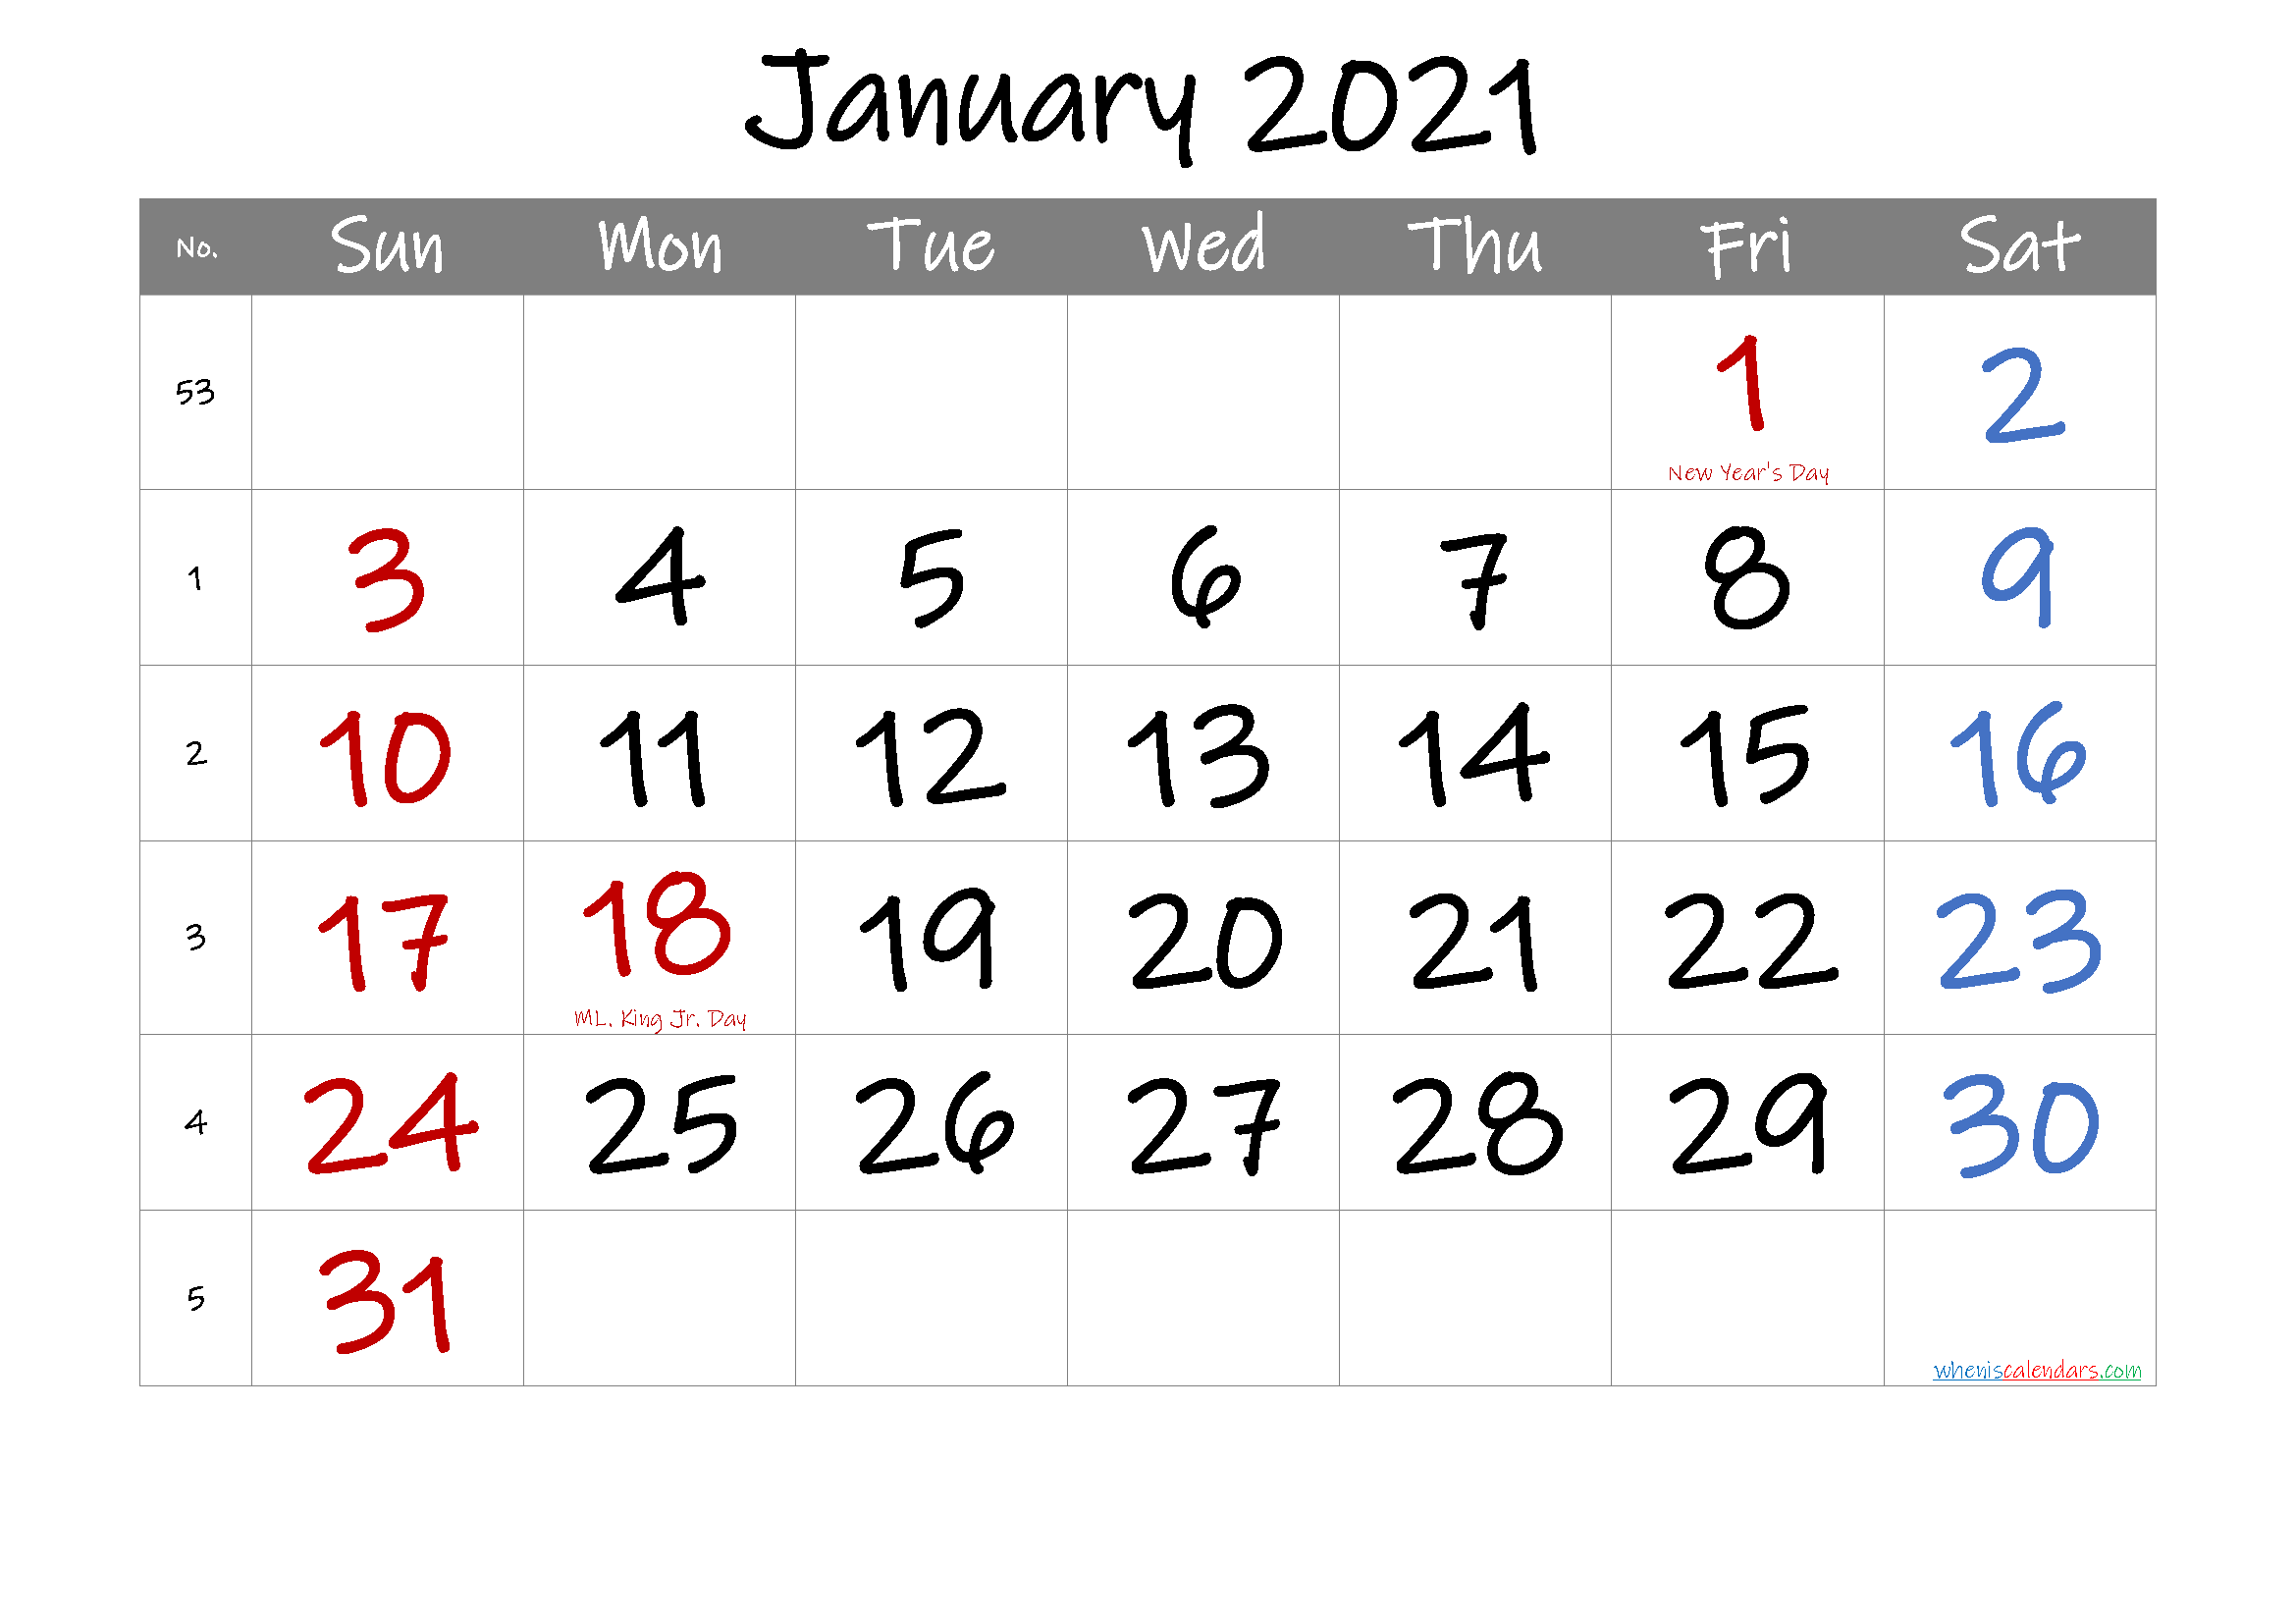 Free January 2021 Printable Calendar with Holidays